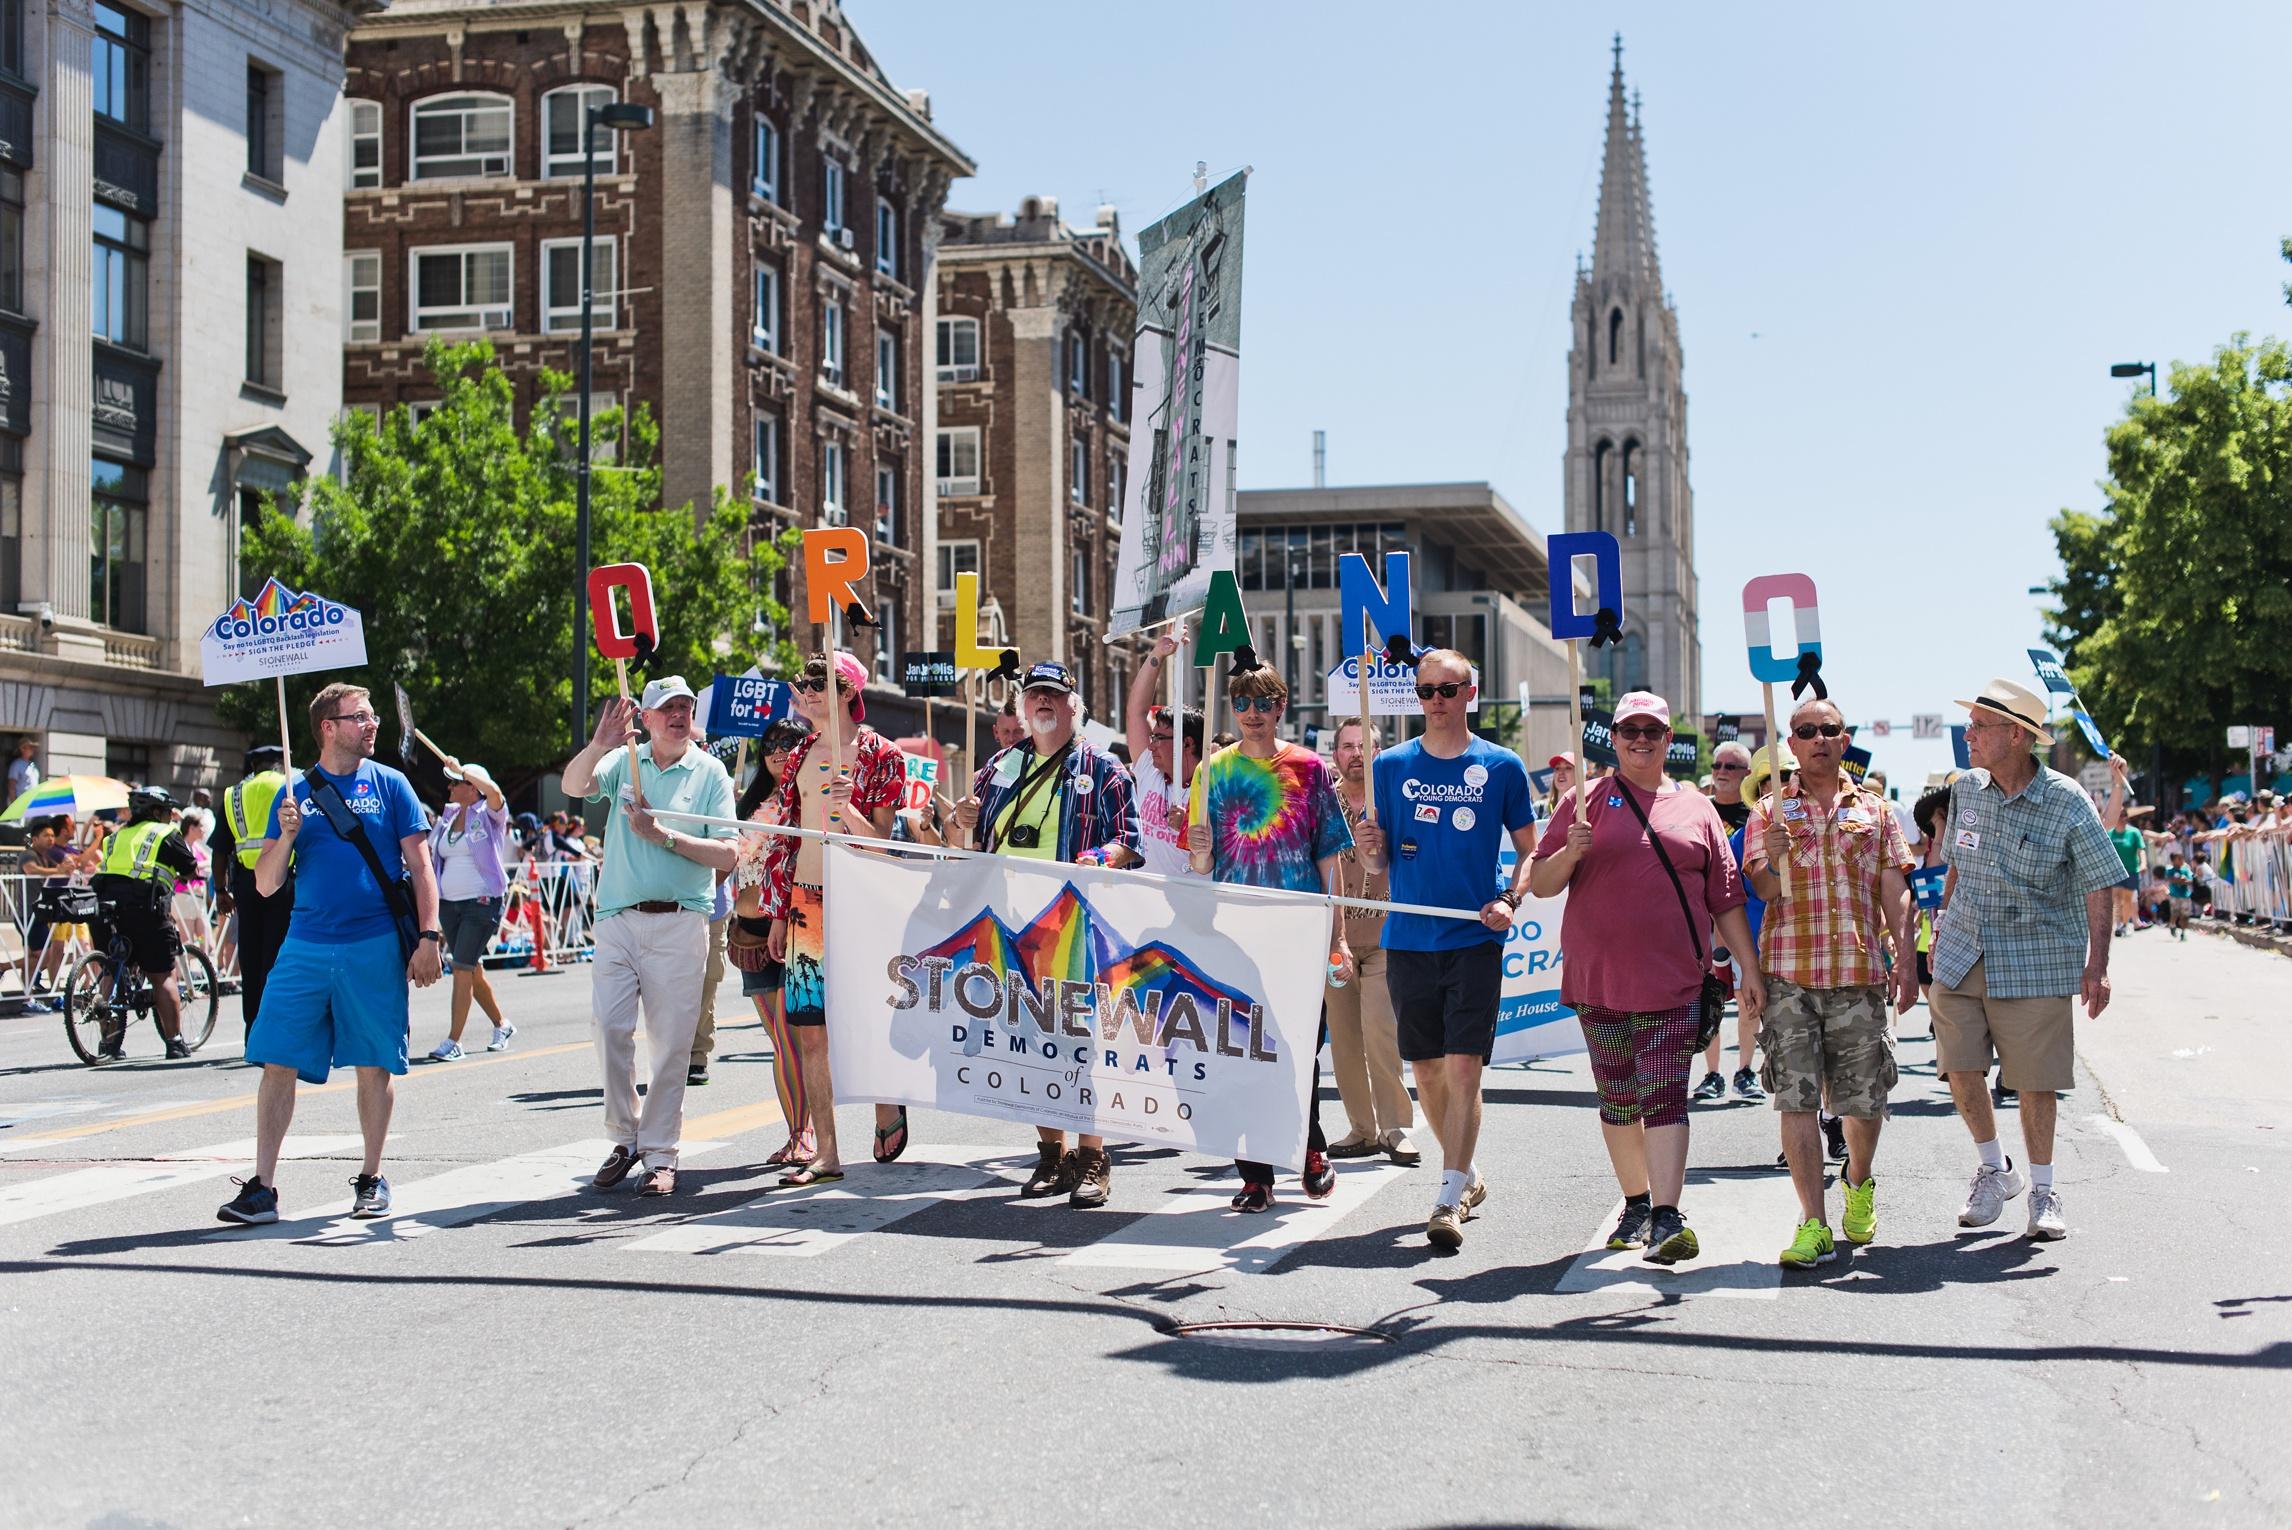 Pride celebration in Denver, Colorado. Photography by Sonja Salzburg of Sonja K Photography.